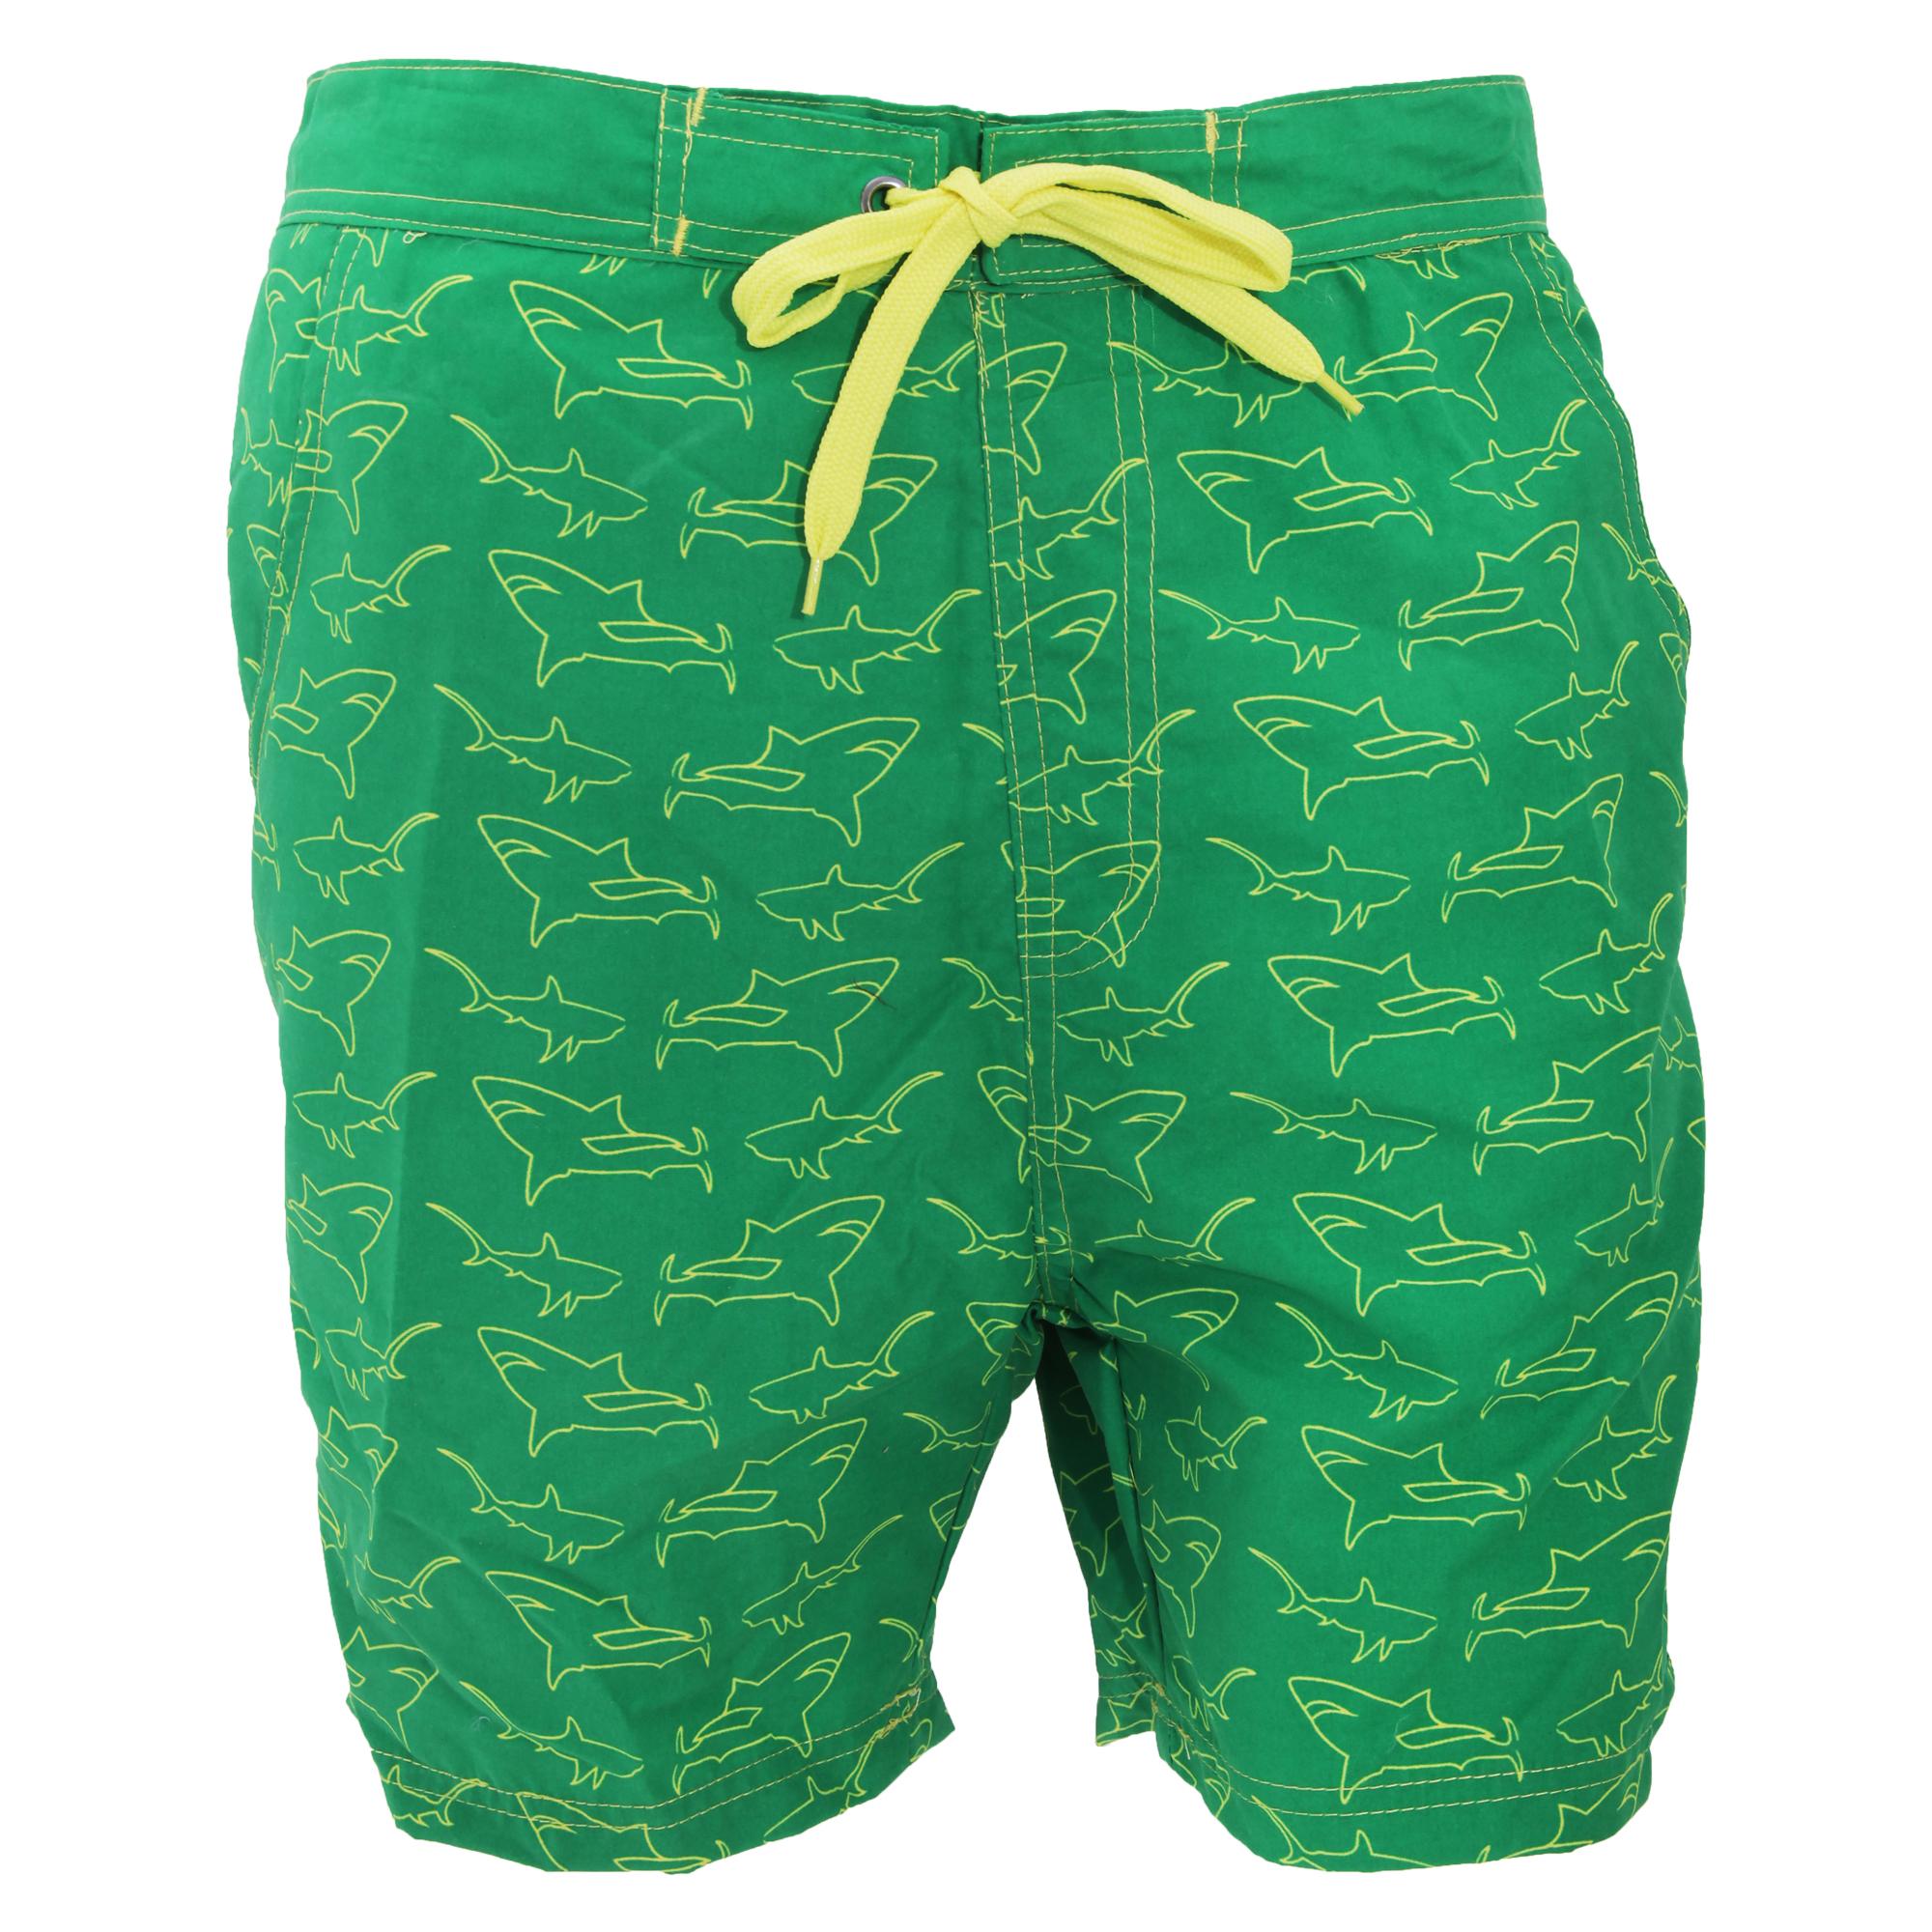 Mens Shark Print Summer Swim Shorts | eBay |Shark Board Shorts For Men